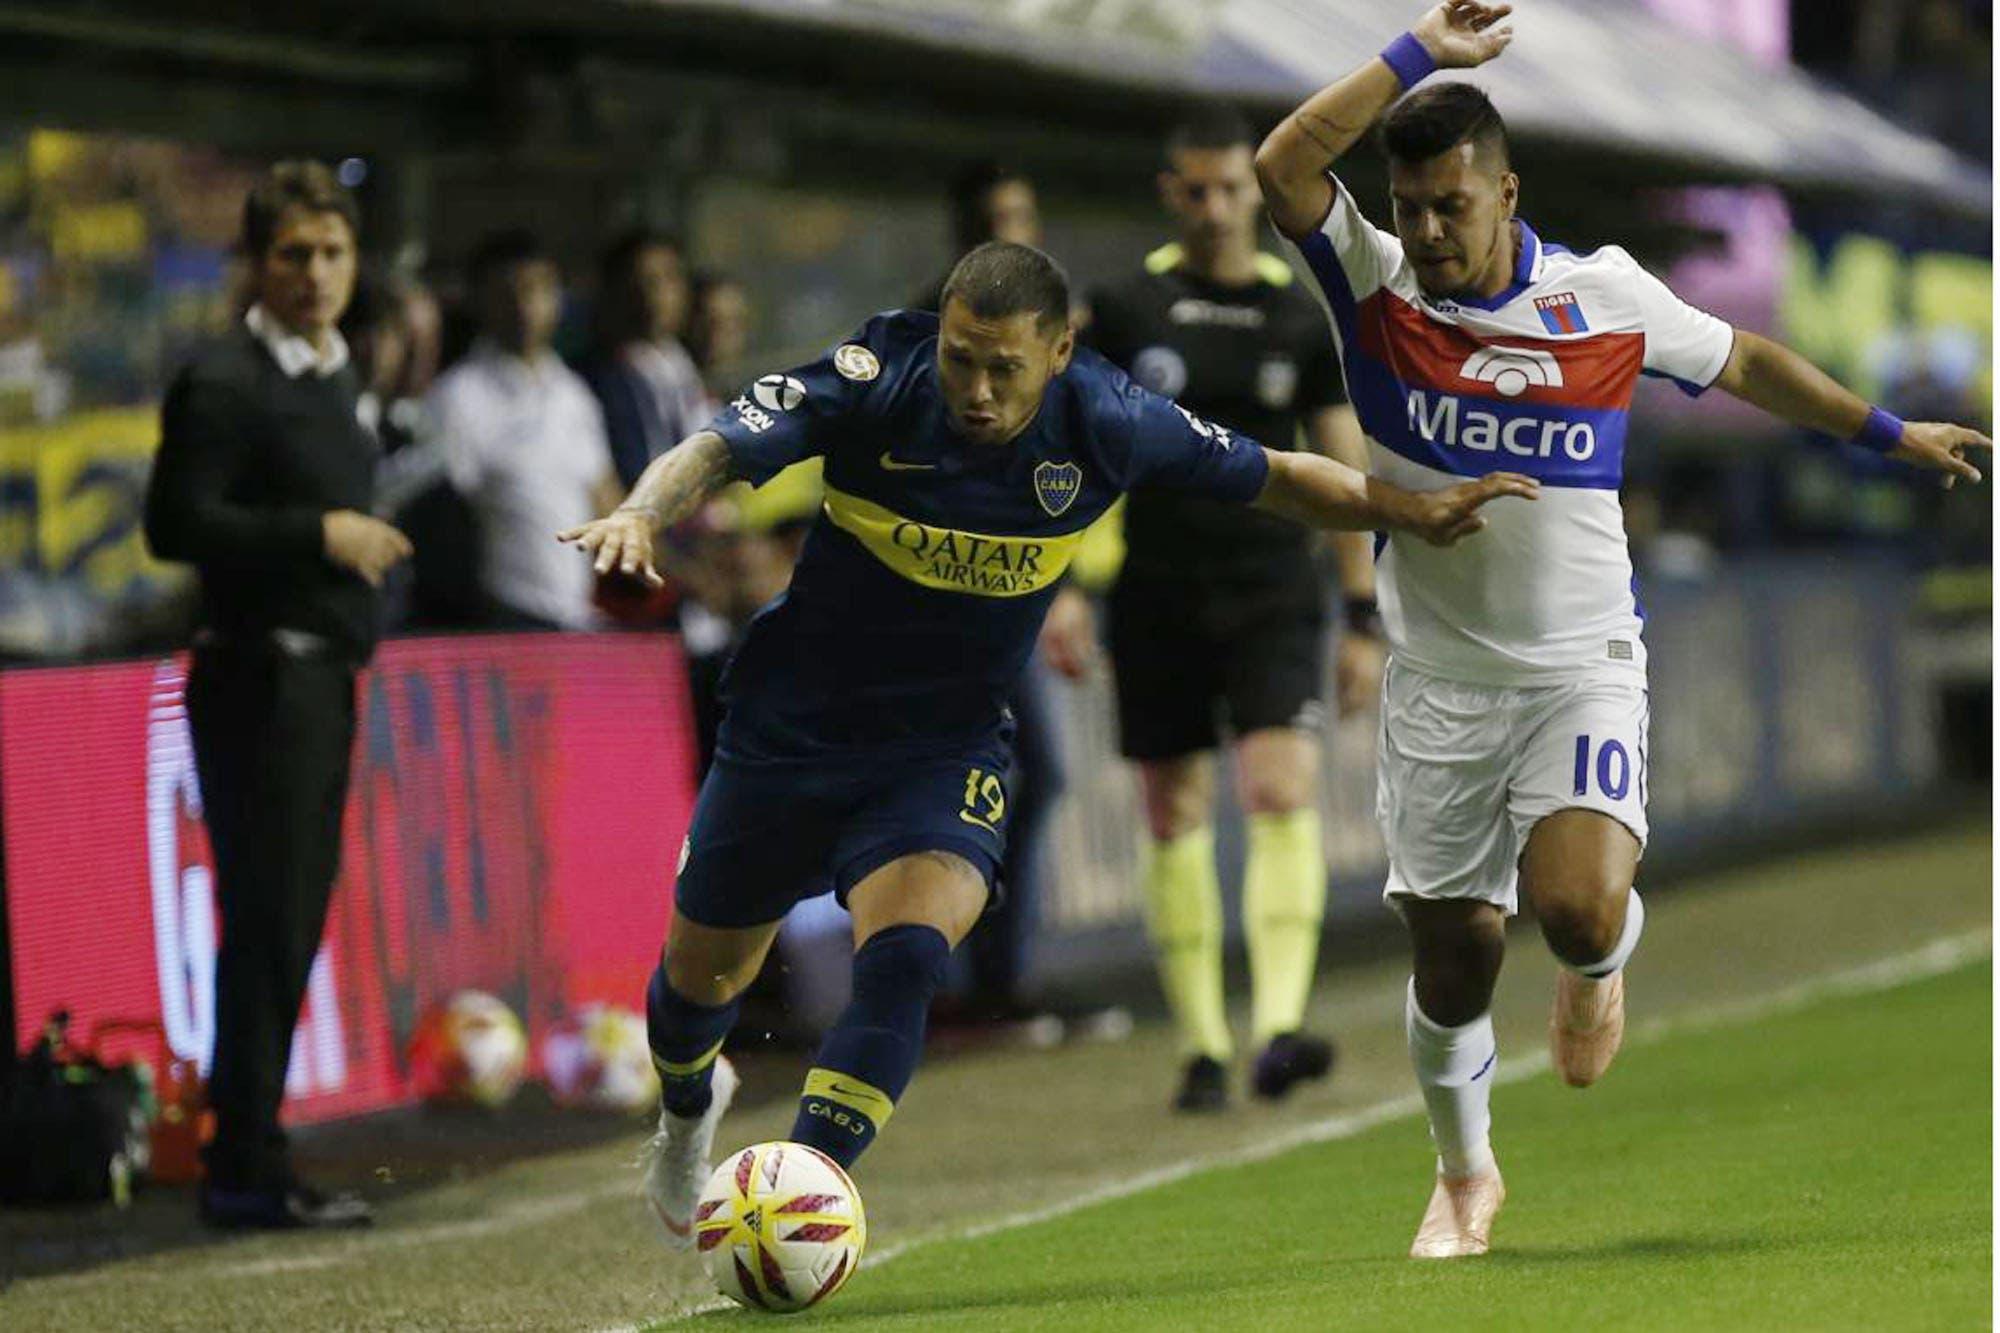 Boca-Tigre, Superliga: el xeneize empata en la Bombonera con un gol de Carlos Tevez